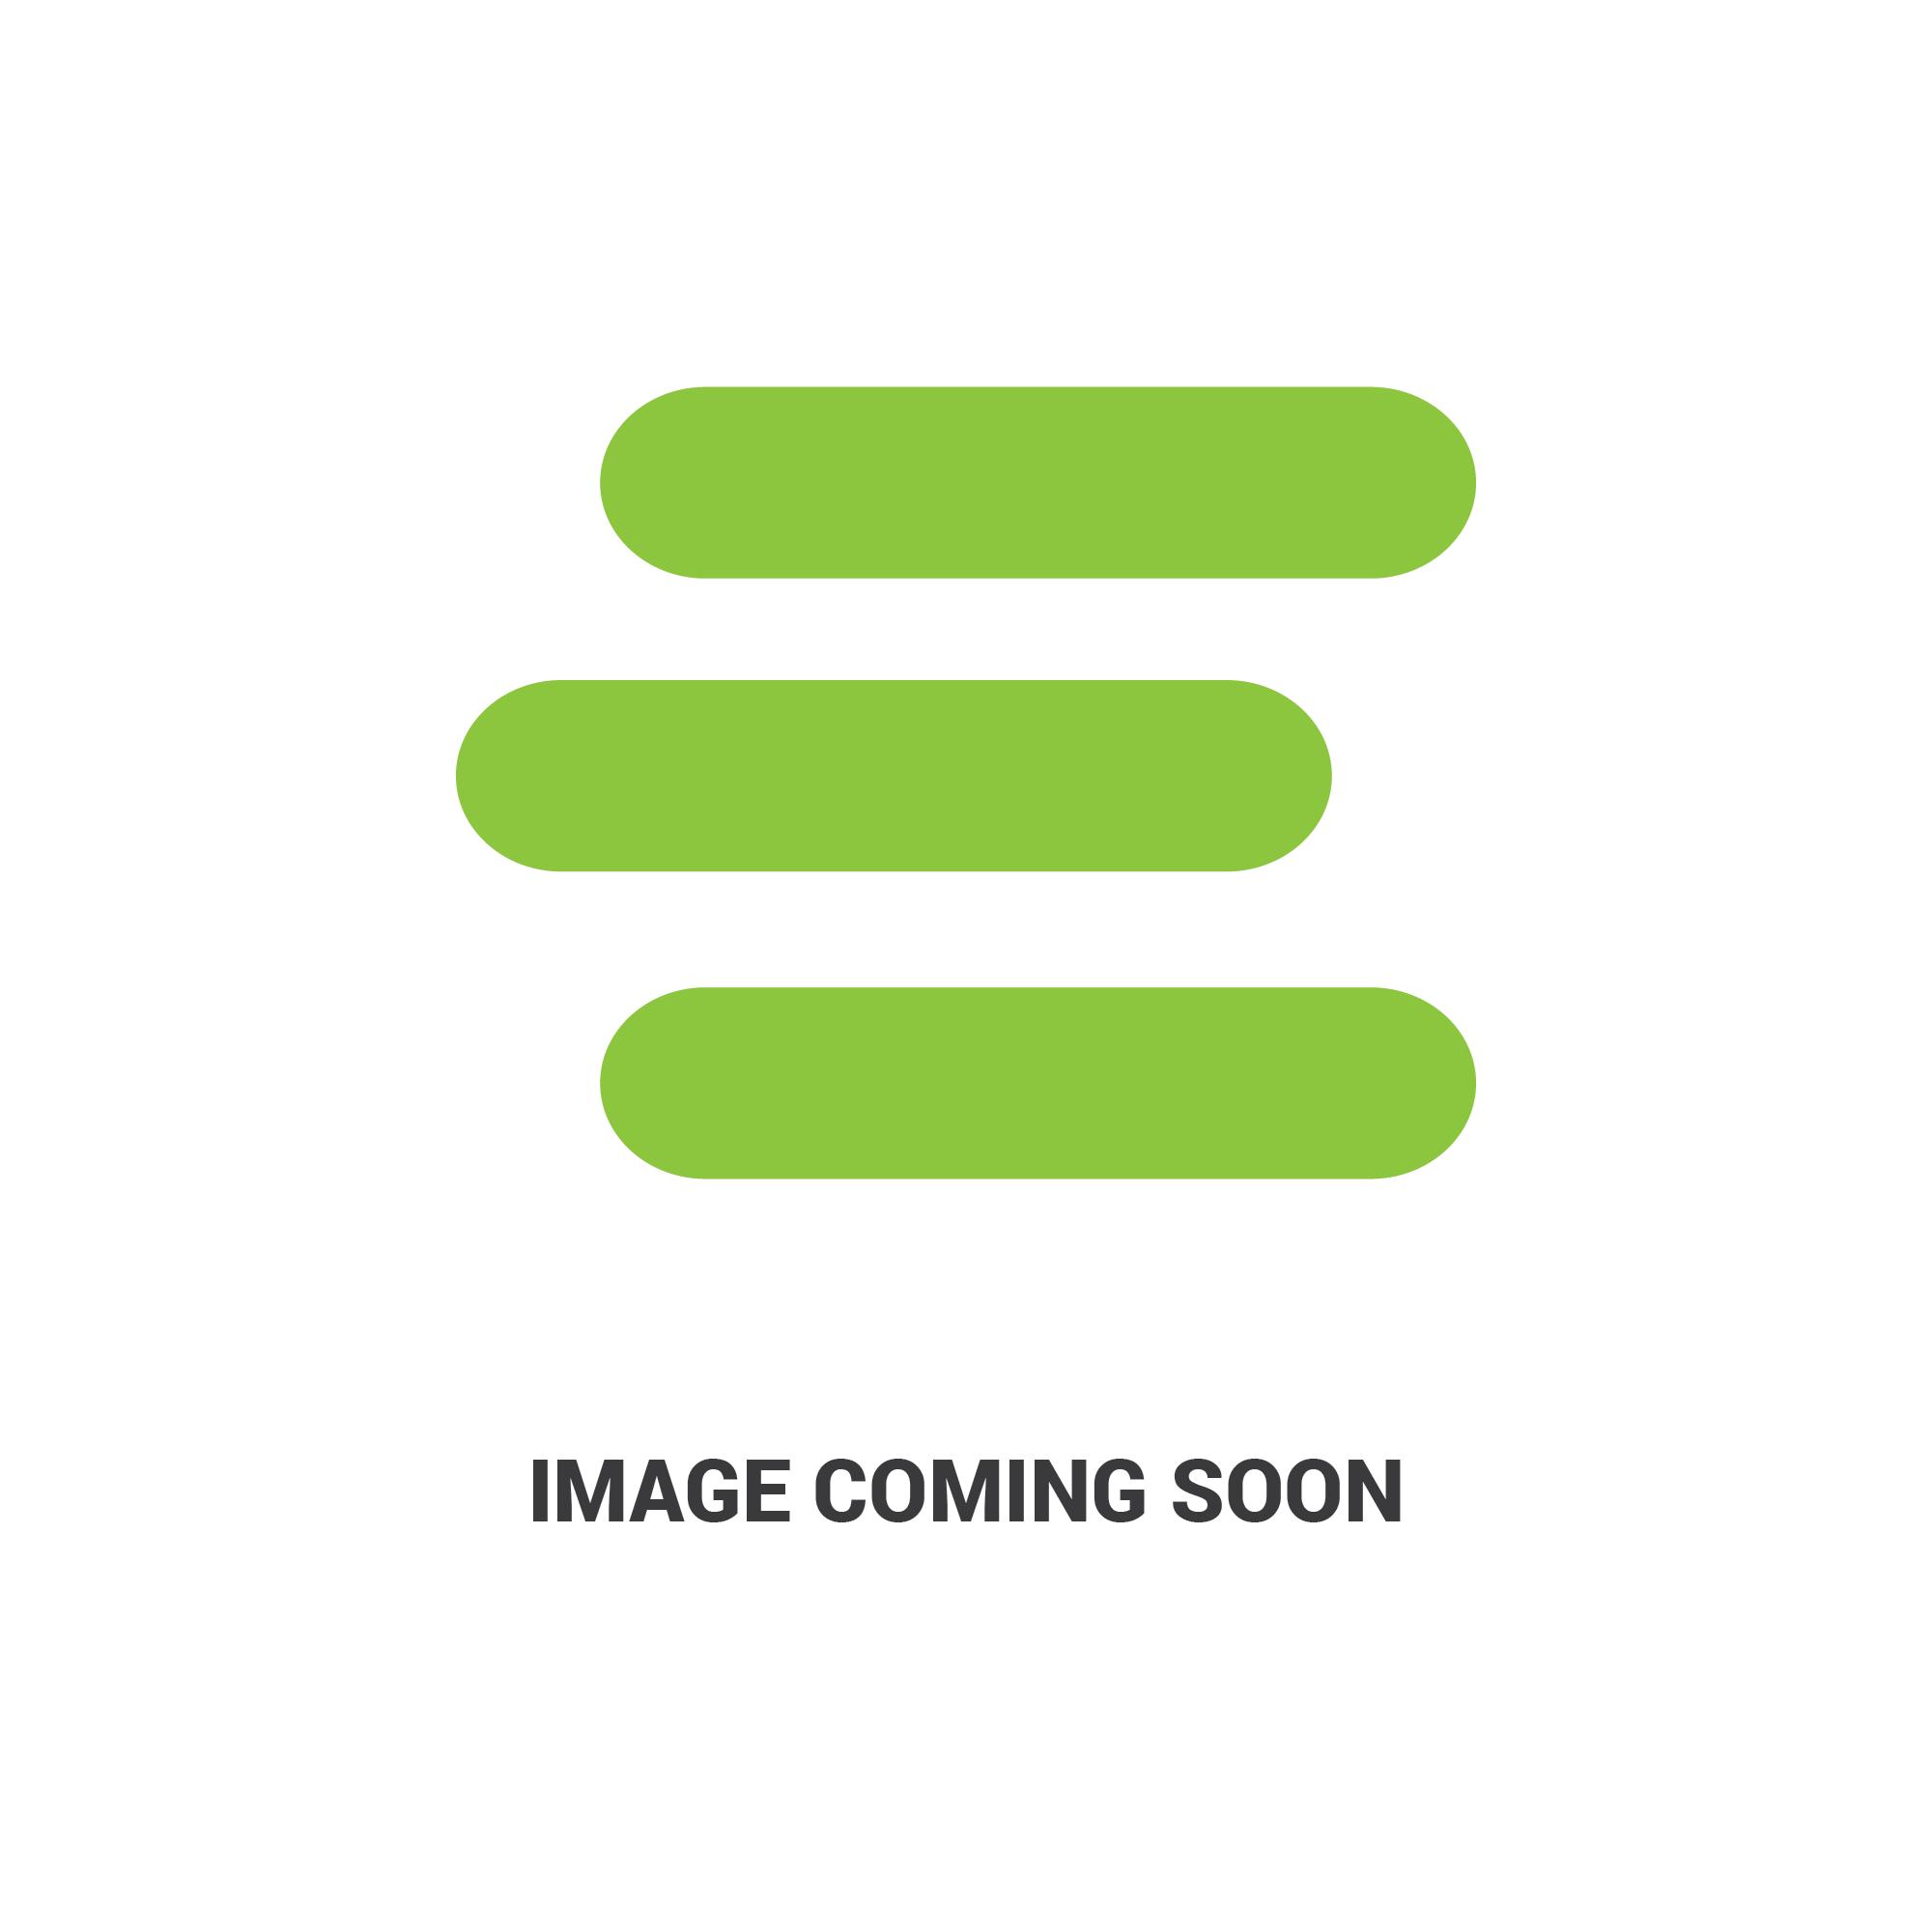 E-6729888edit 1.jpg